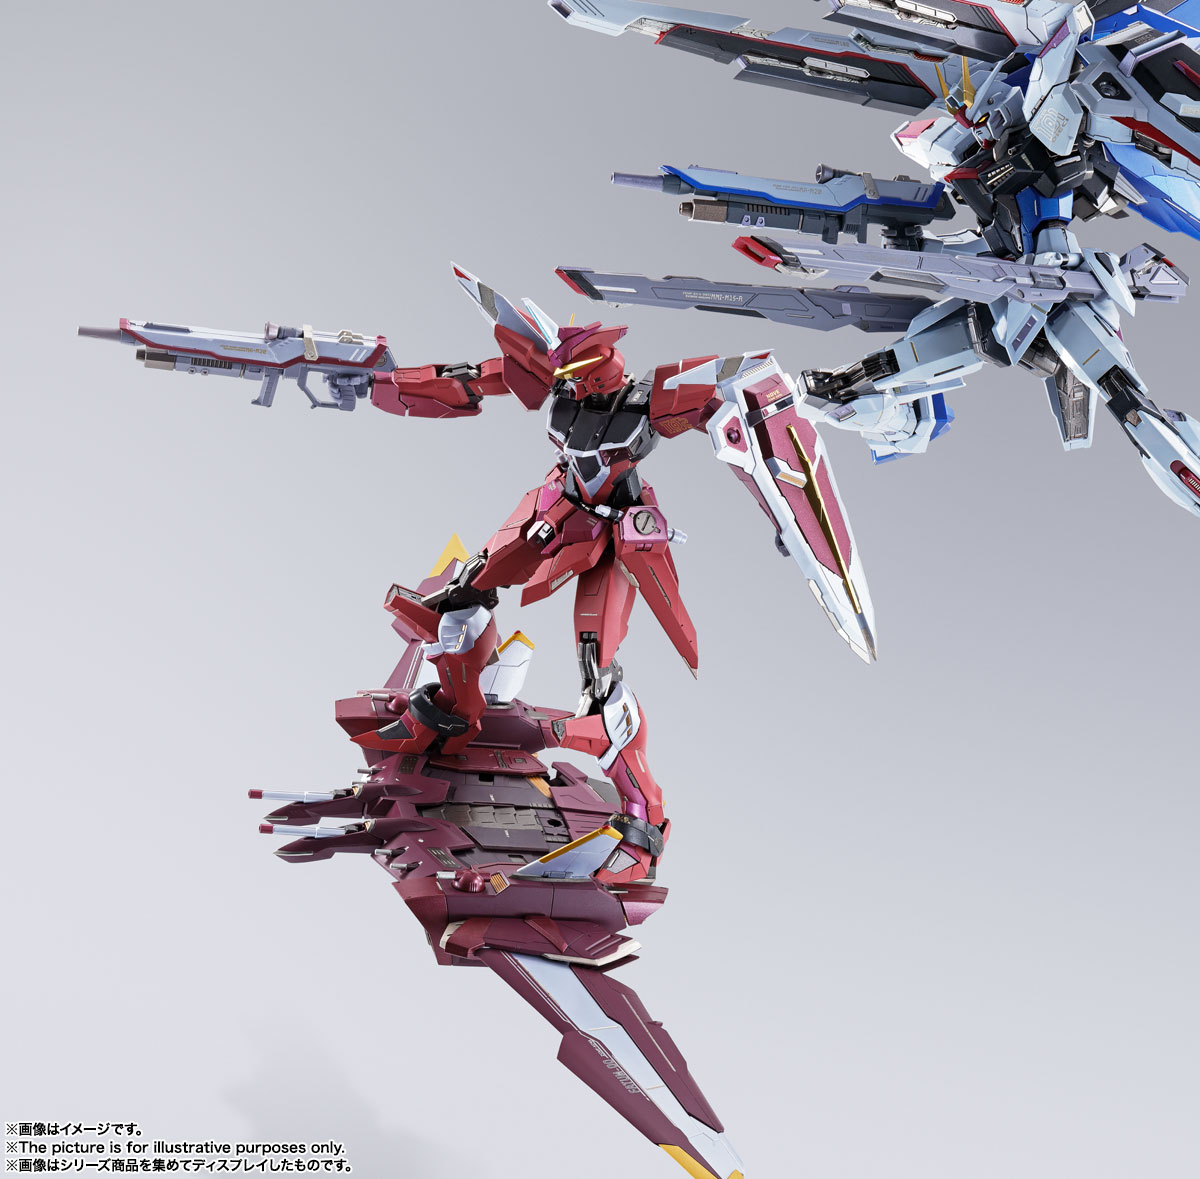 METAL BUILD『ジャスティスガンダム』機動戦士ガンダムSEED 可動フィギュア-011